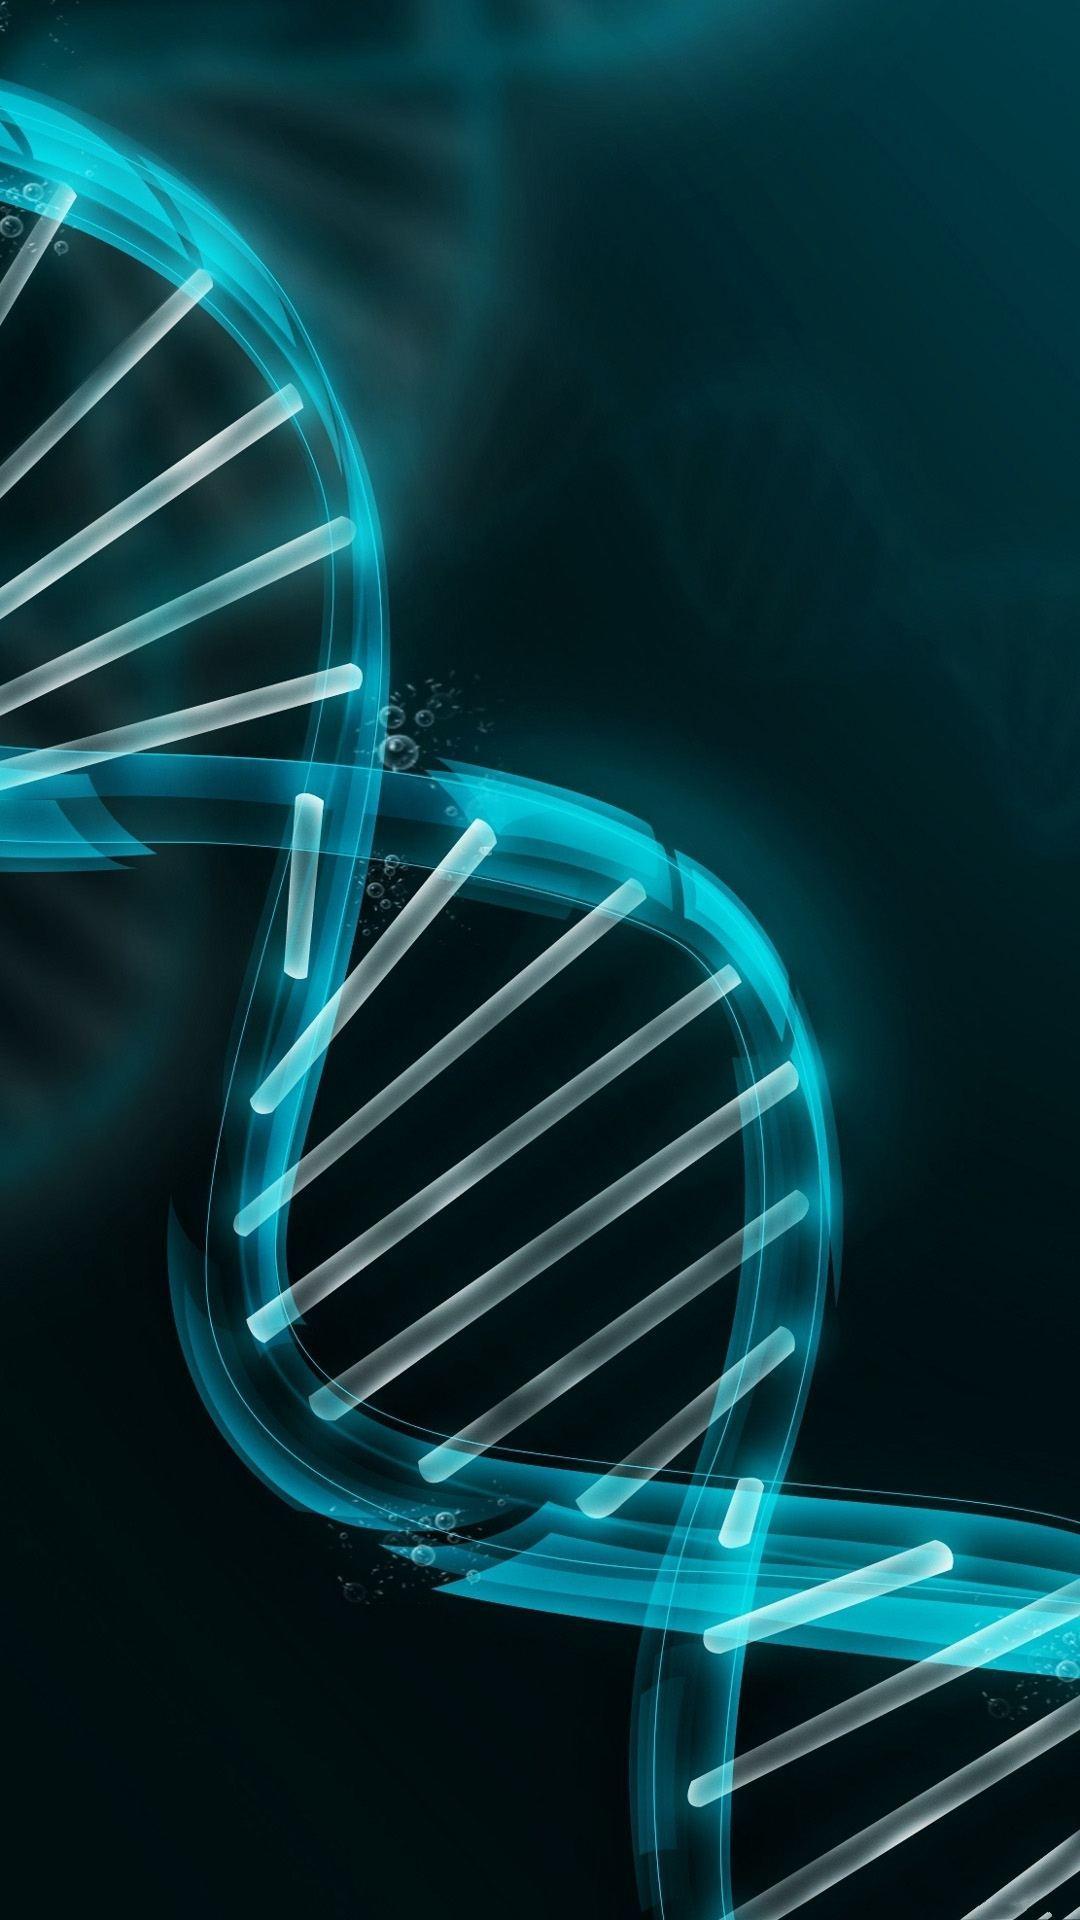 DNA Strand Illustration iPhone 6 Plus HD Wallpaper